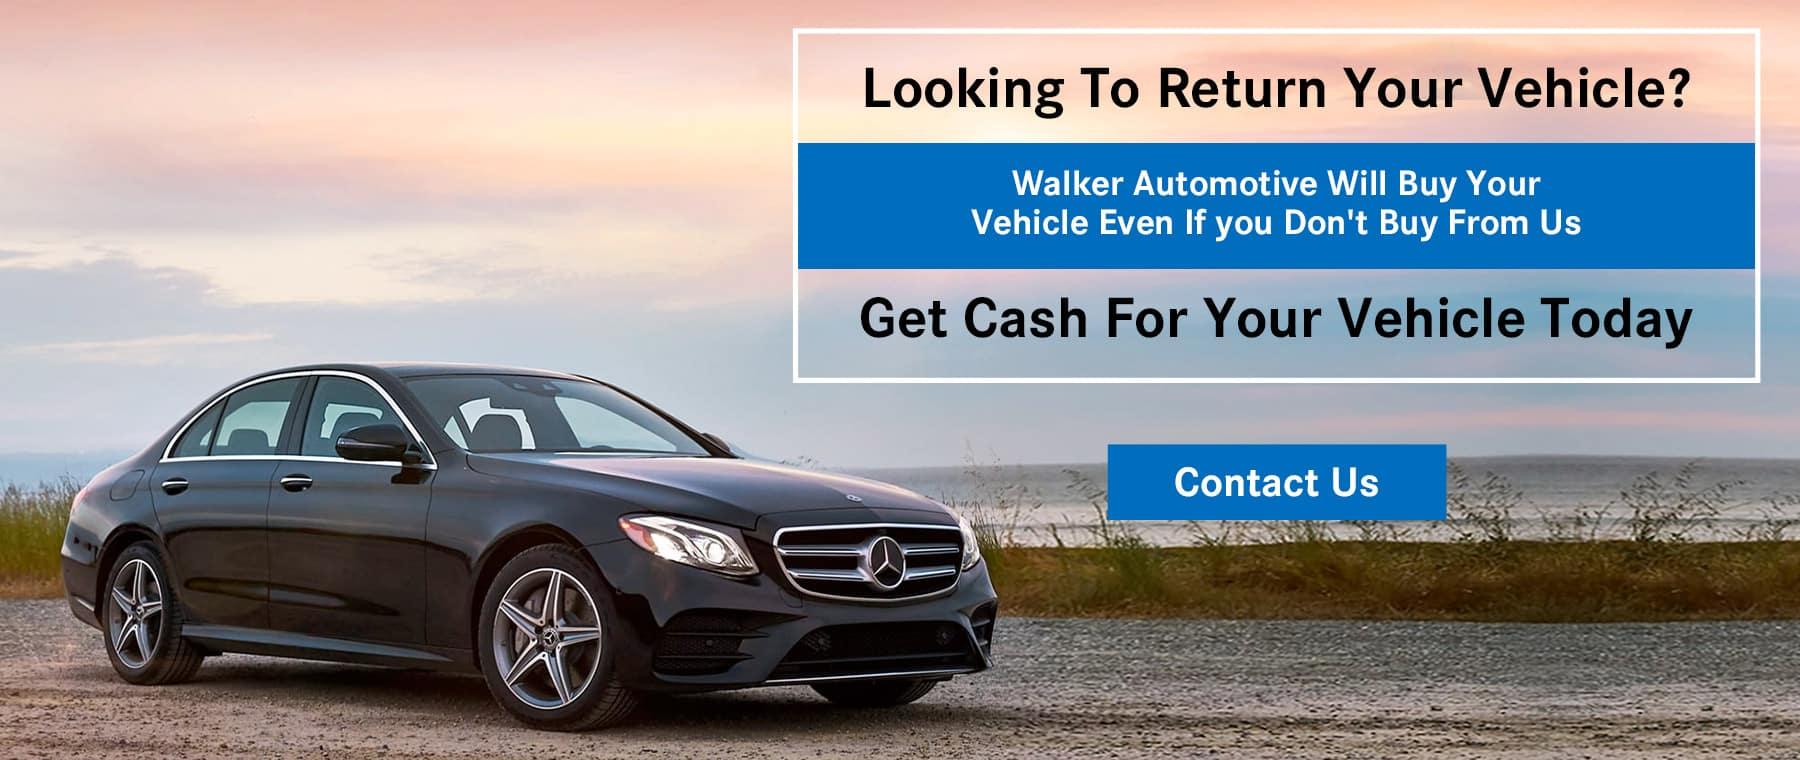 webuycars-slide_1800x760-august-2020